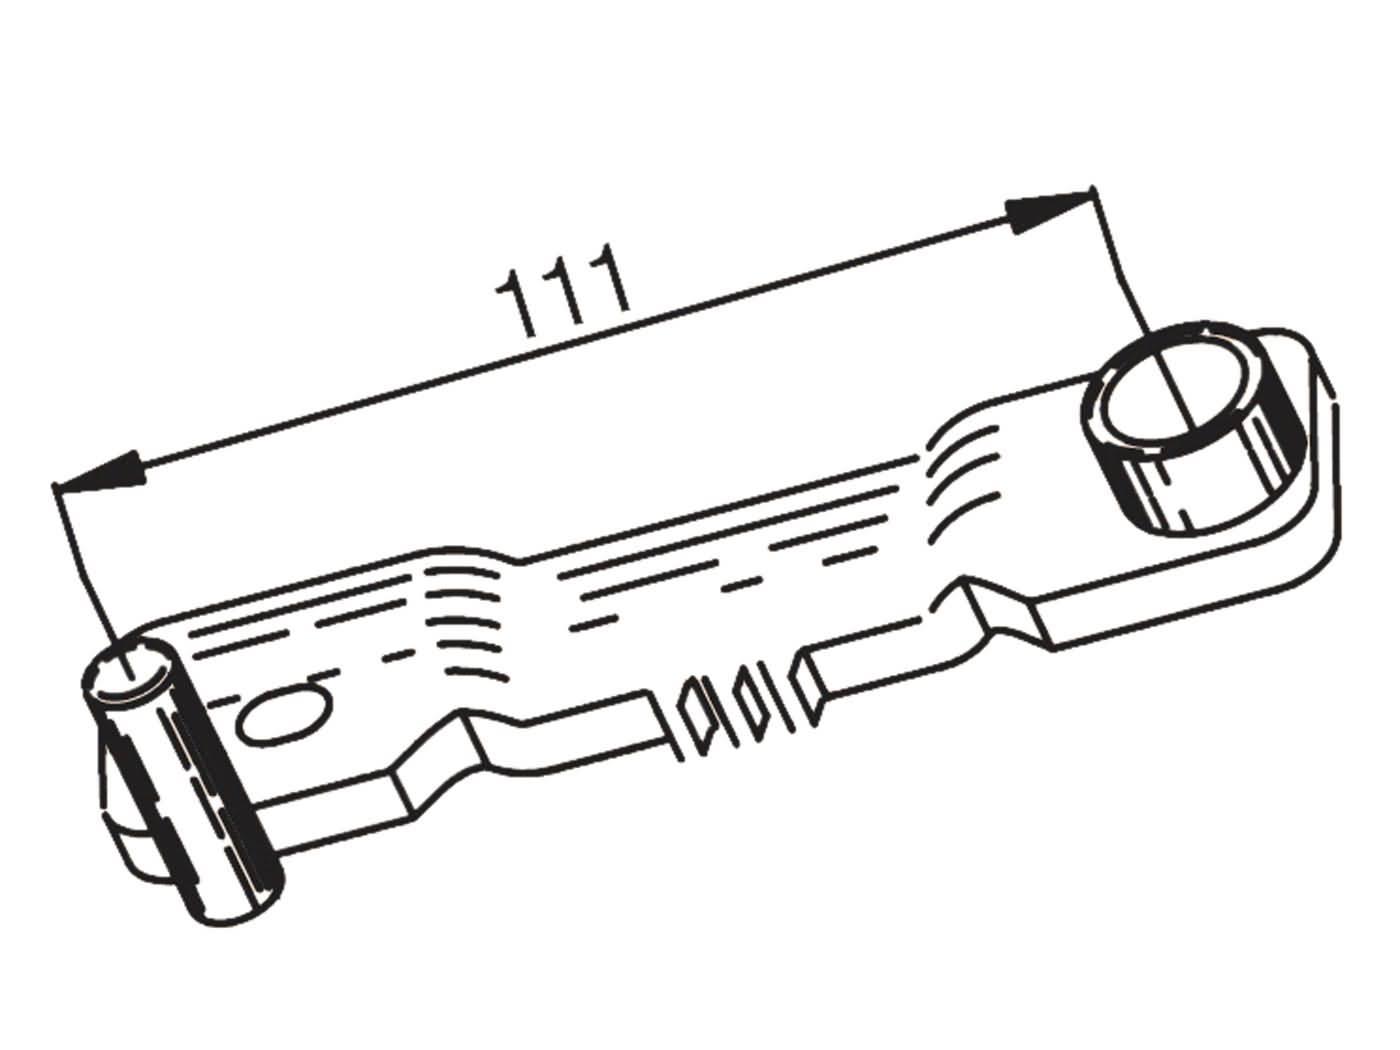 variator holder / blocking tool Buzzetti for Peugeot, Sym